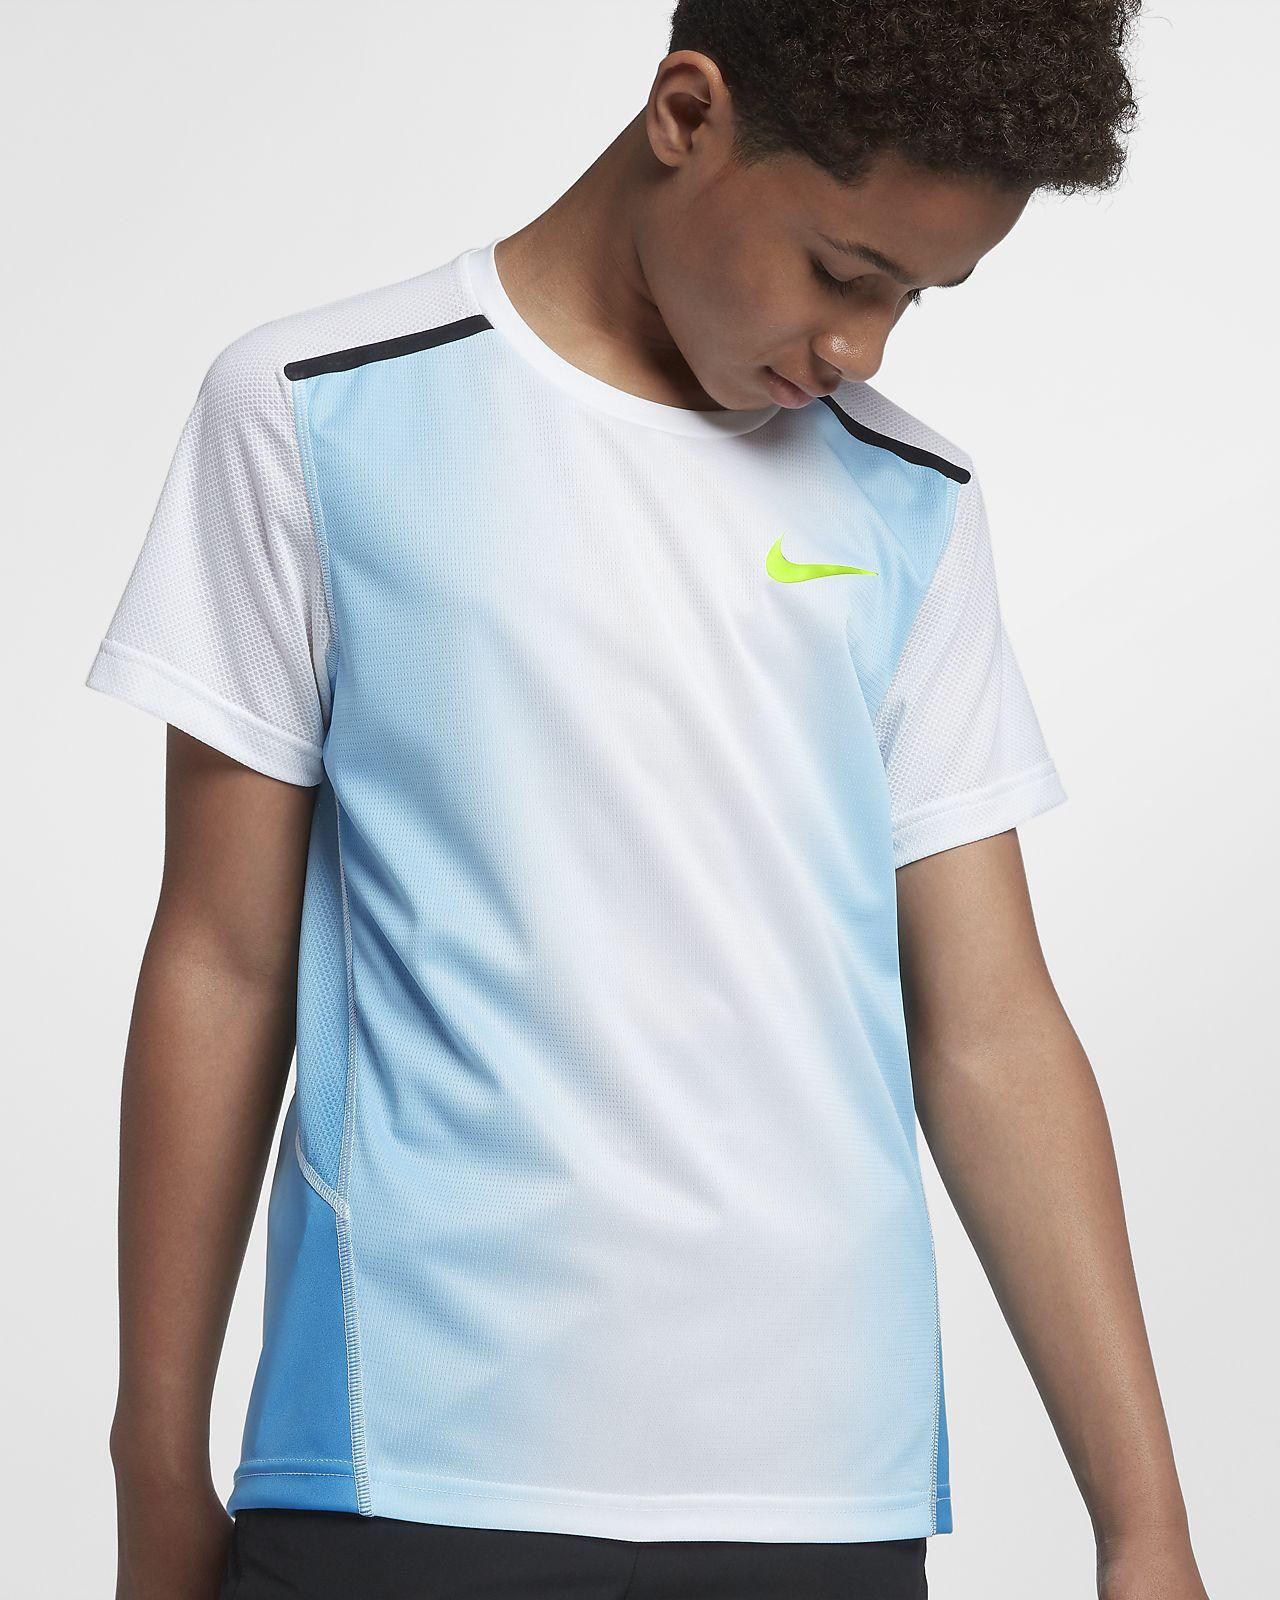 Nike Trainingstop met korte mouwen jongens